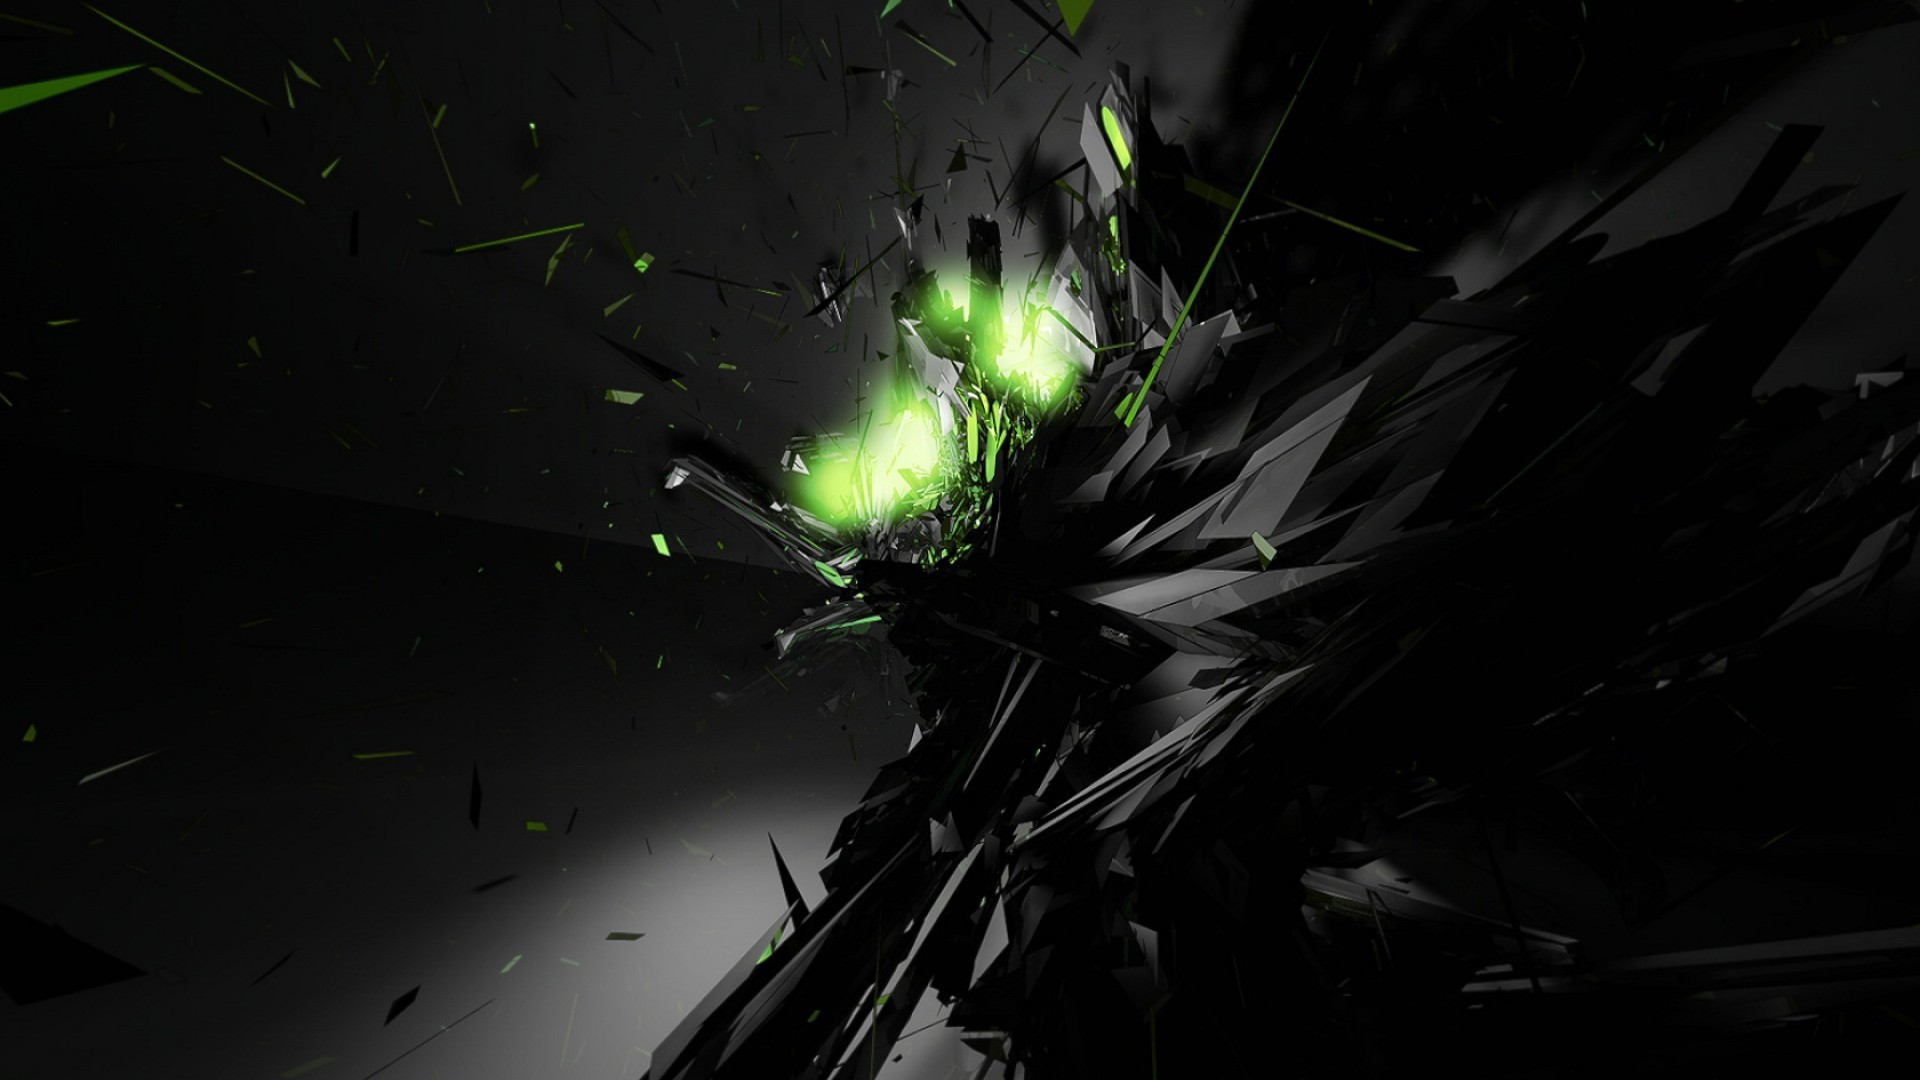 Res: 1920x1080, Black Abstract Green Glow Desktop Wallpaper